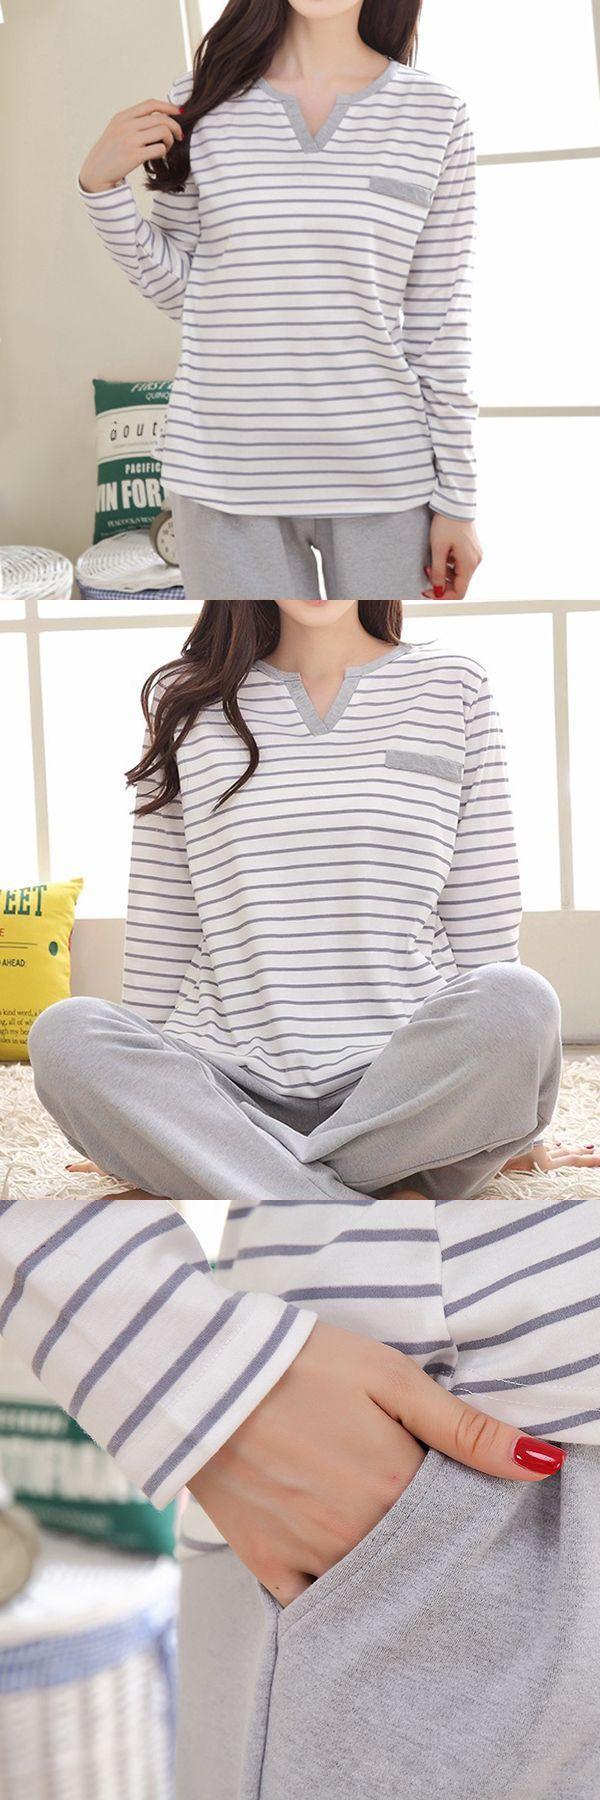 Comfy stripy cotton sleepwear sets two piece leisure home wear for women  turkish fashion sleepwear #clementine #sleepwear #and #robes #lati #fashion #sleepwear #sleepwear #pajamas #and #robes #womens #sleepwear #robes #sale